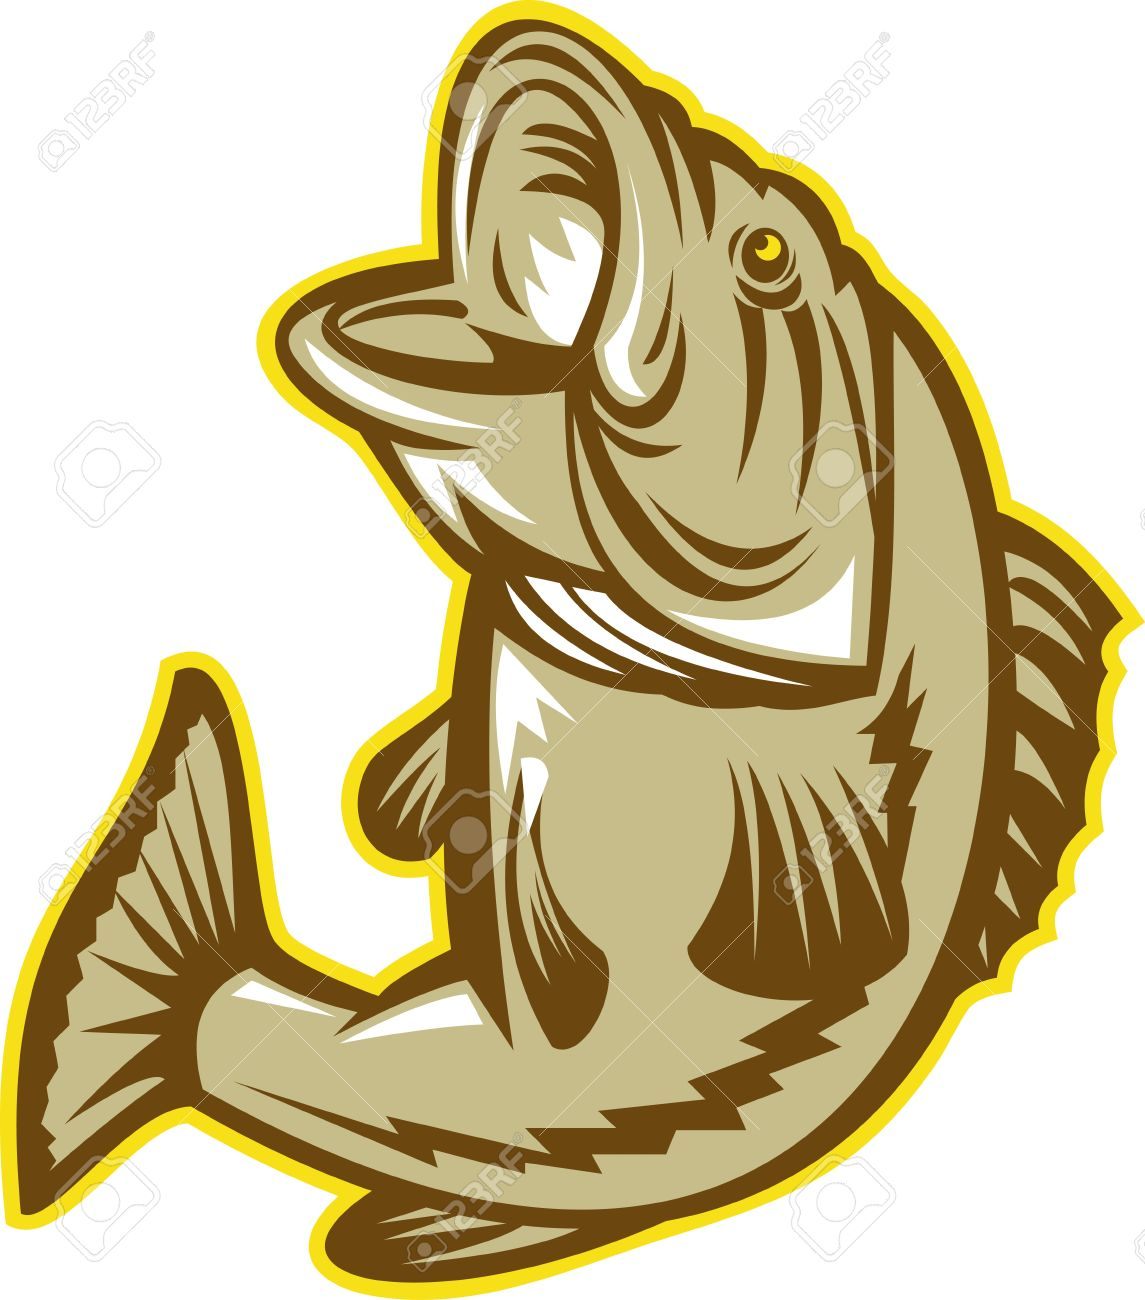 Freshwater fish jumping - Bass Fish Jumping Illustration Of A Largemouht Bass Fish Jumping Done In Retro Woodcut Style